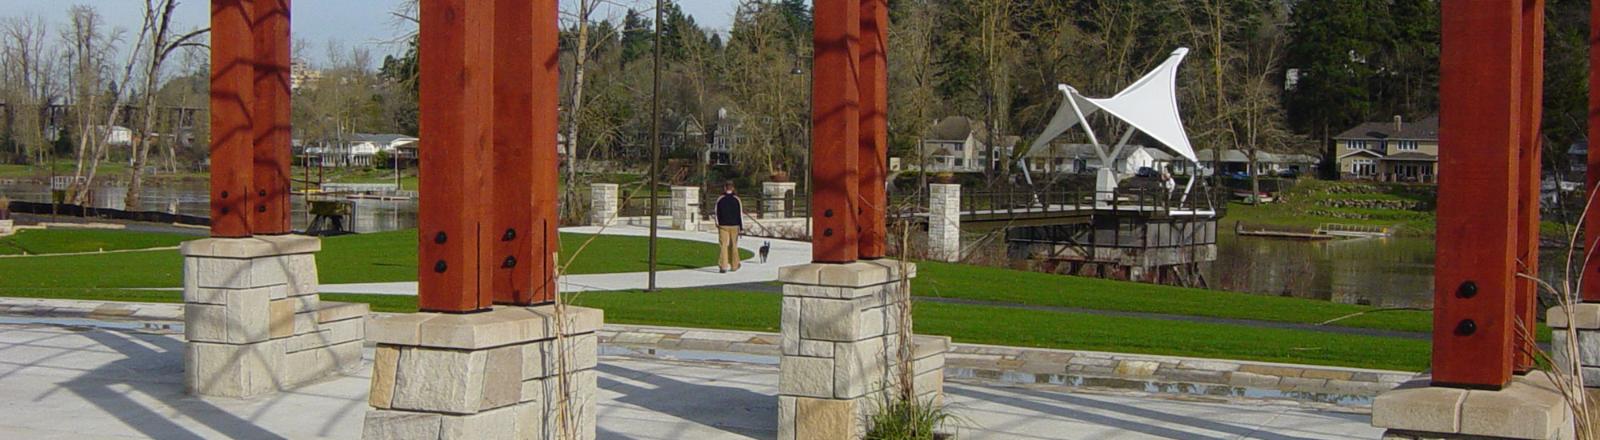 Foothills Park, Pioneer Spirit Sculpture